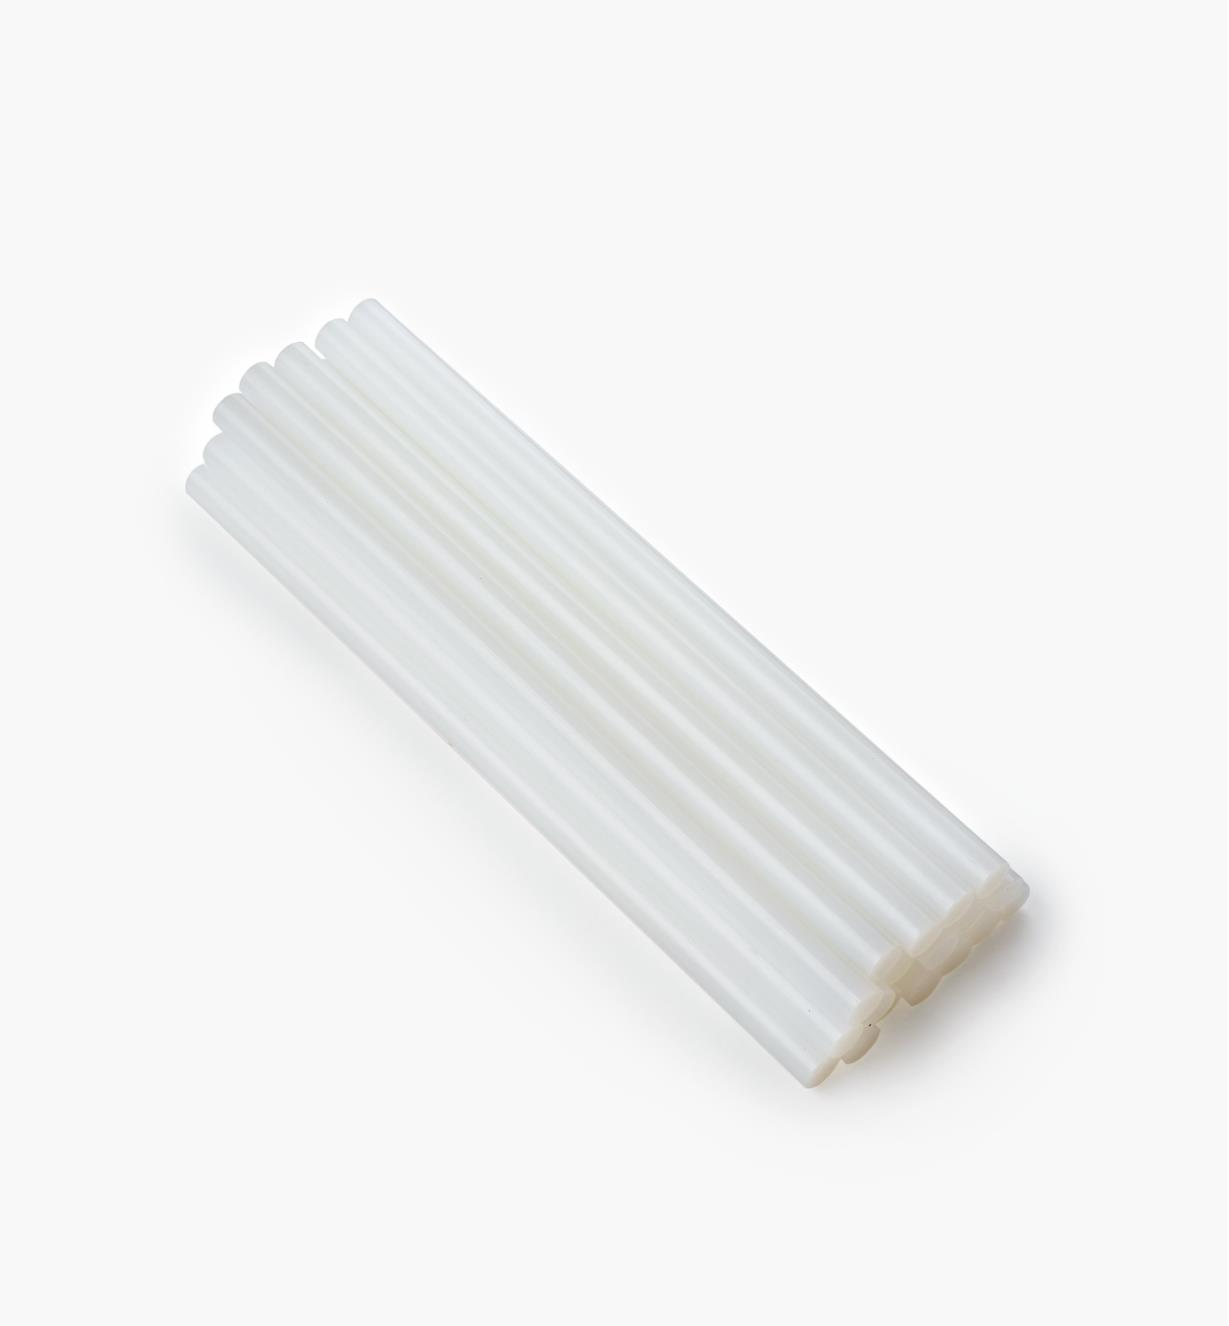 03K0356 - Flex 40 Adhesive Sticks, pkg of 18